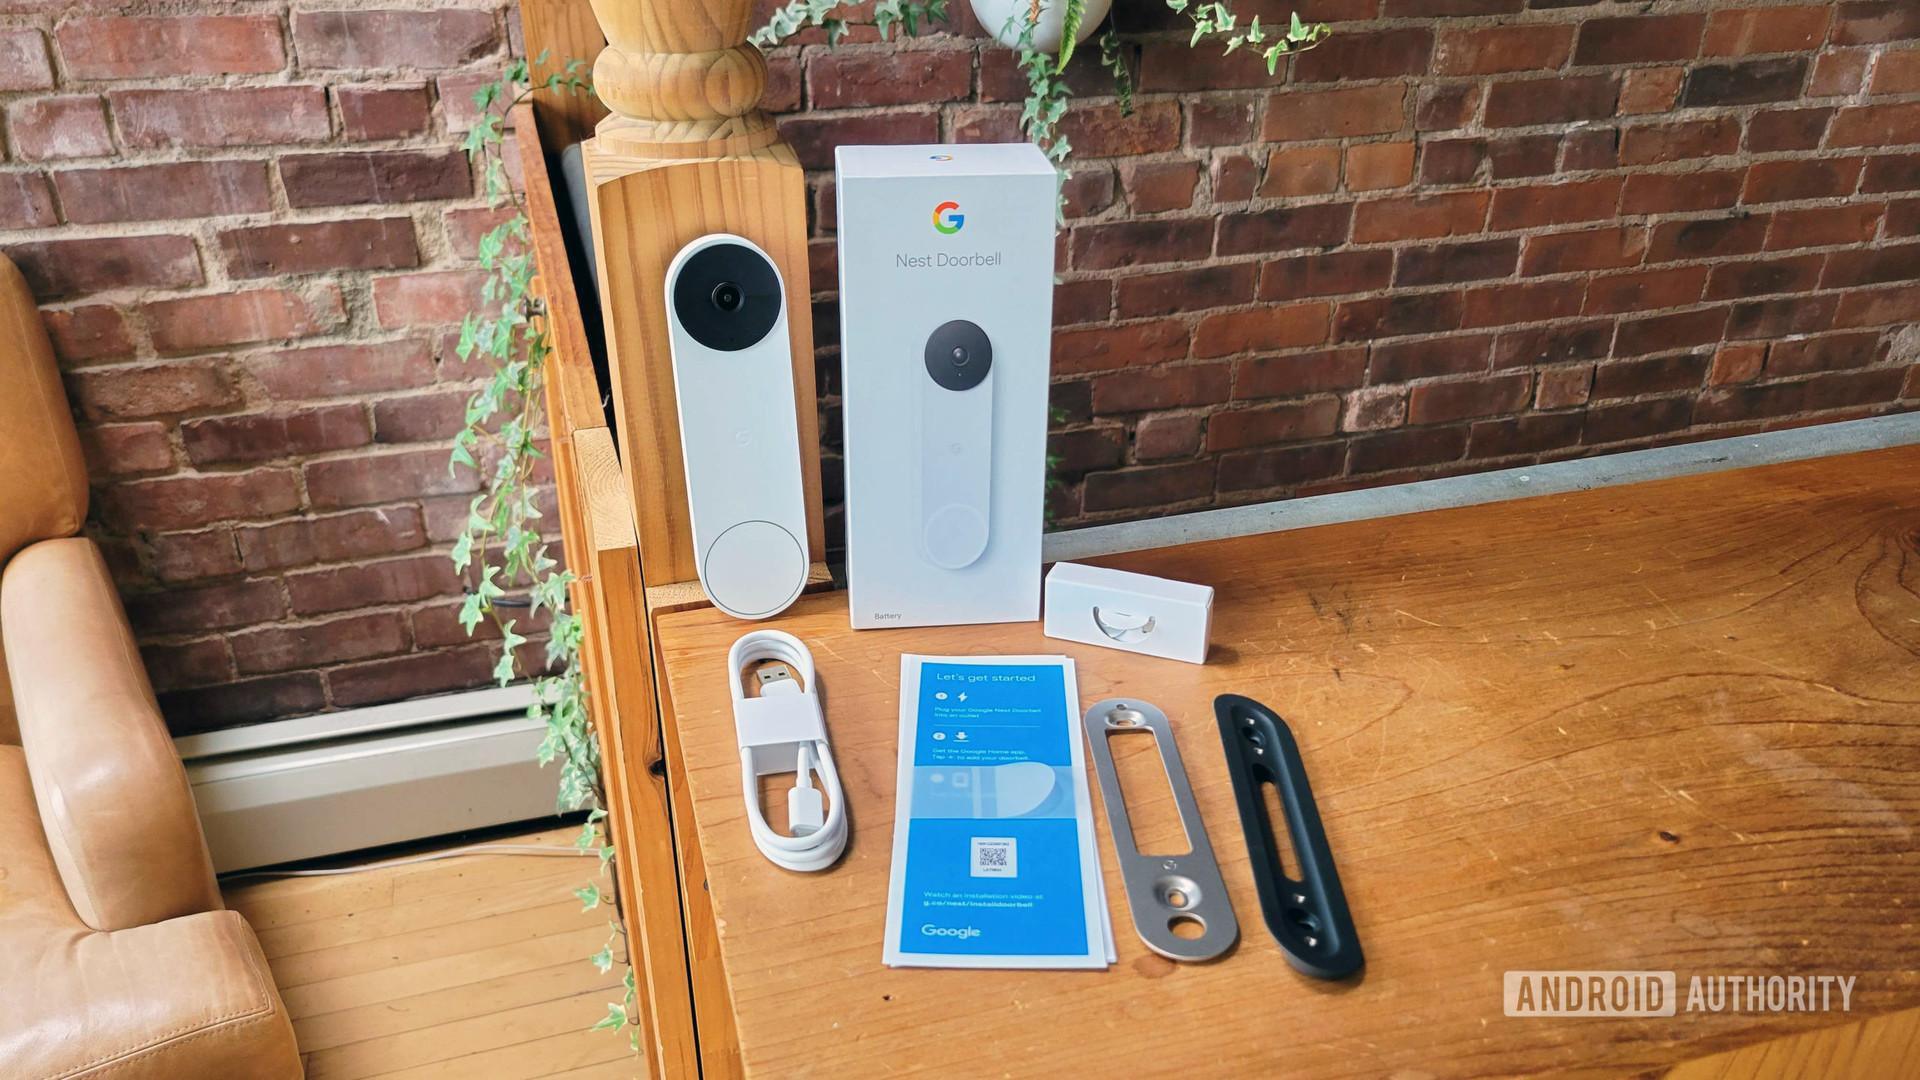 Google Nest Doorbell Review Retail In Box Contents